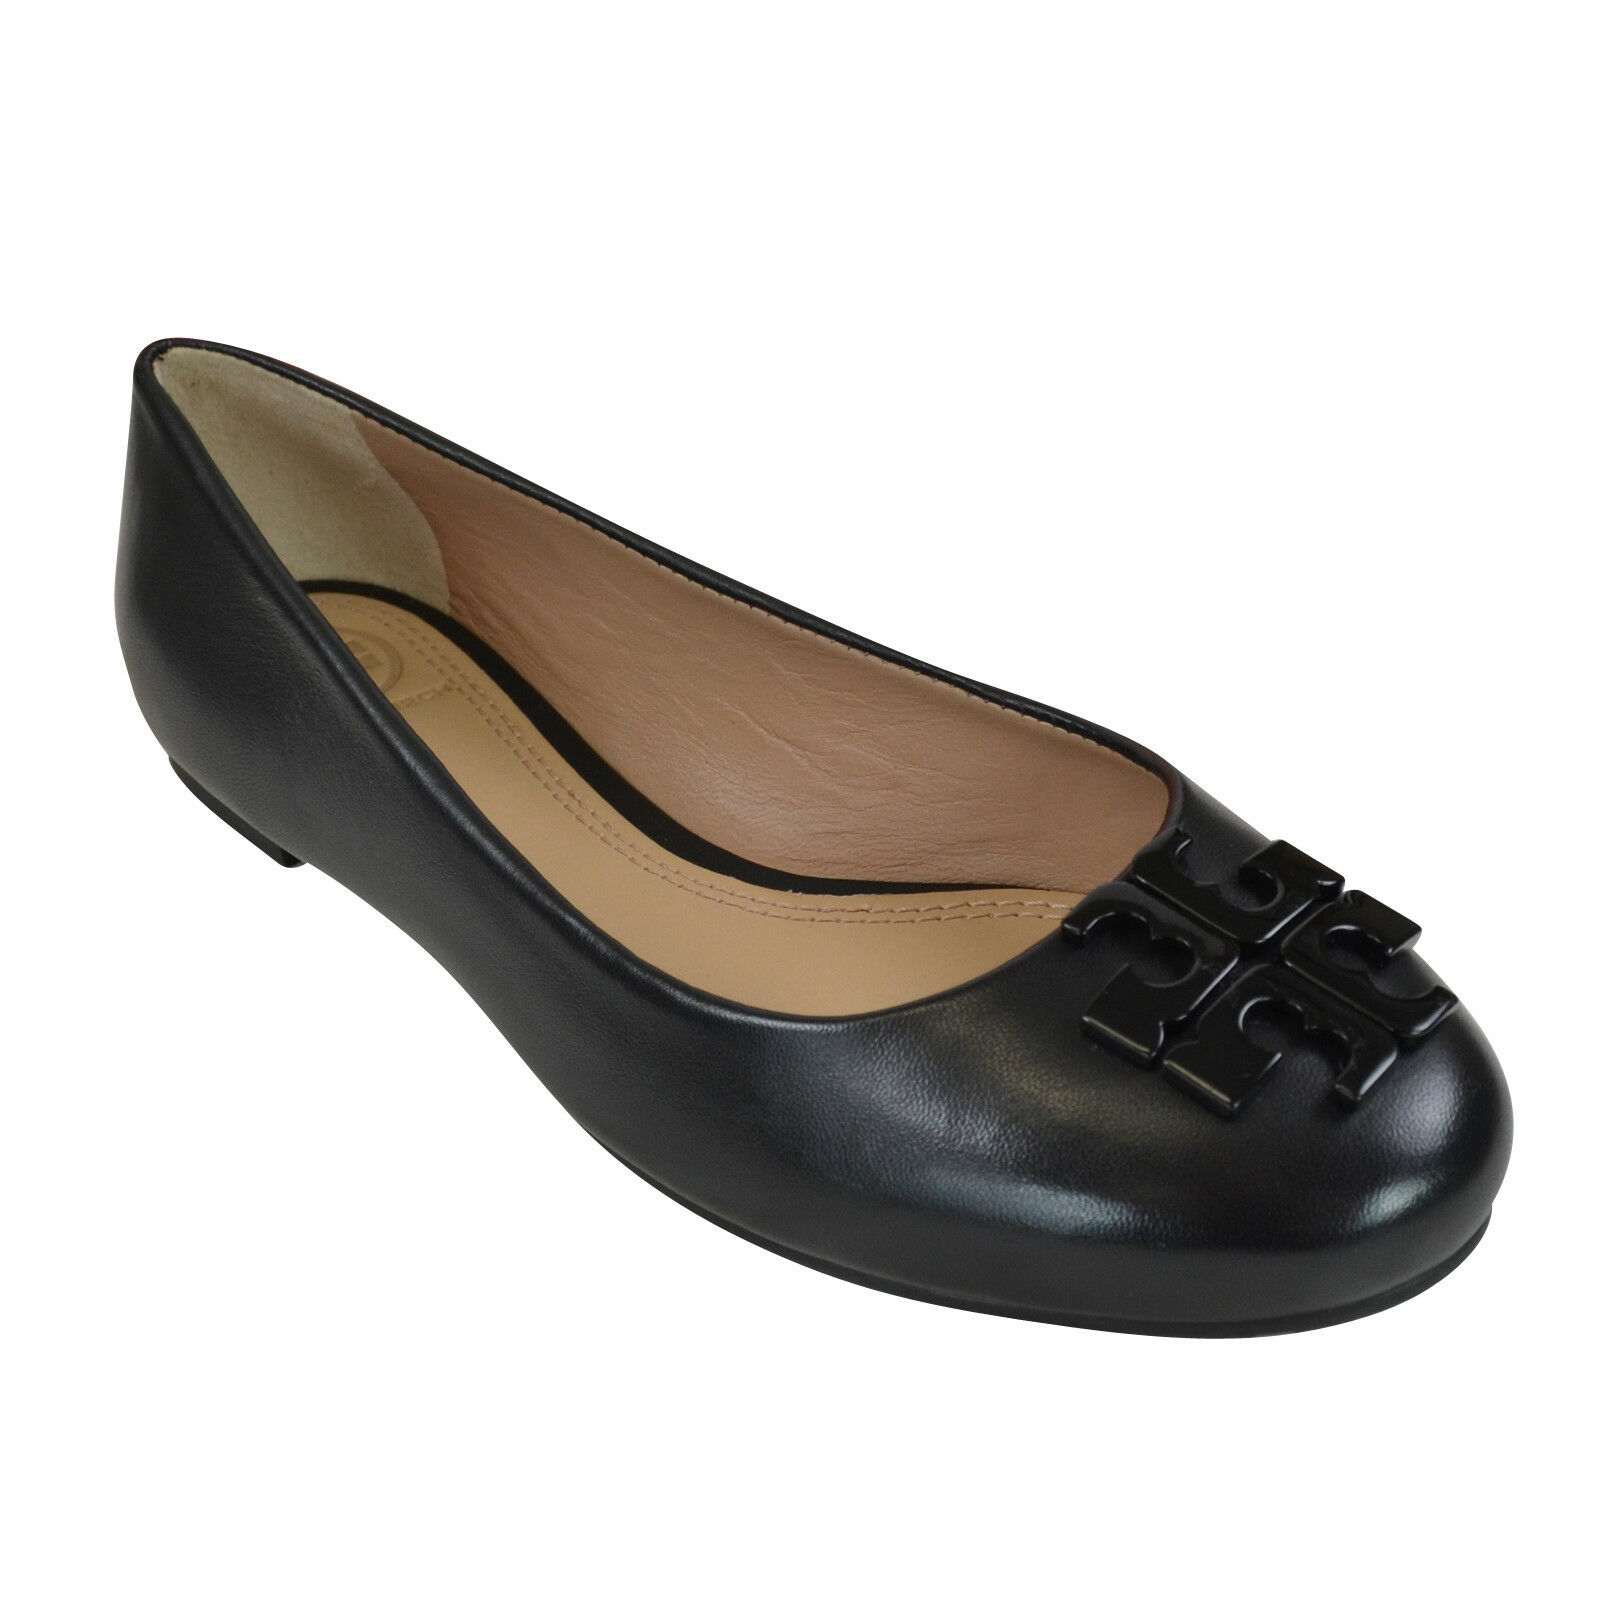 NIB  Tory Burch Lowell 2 Leather Ballet Flats nero 8  ti aspetto